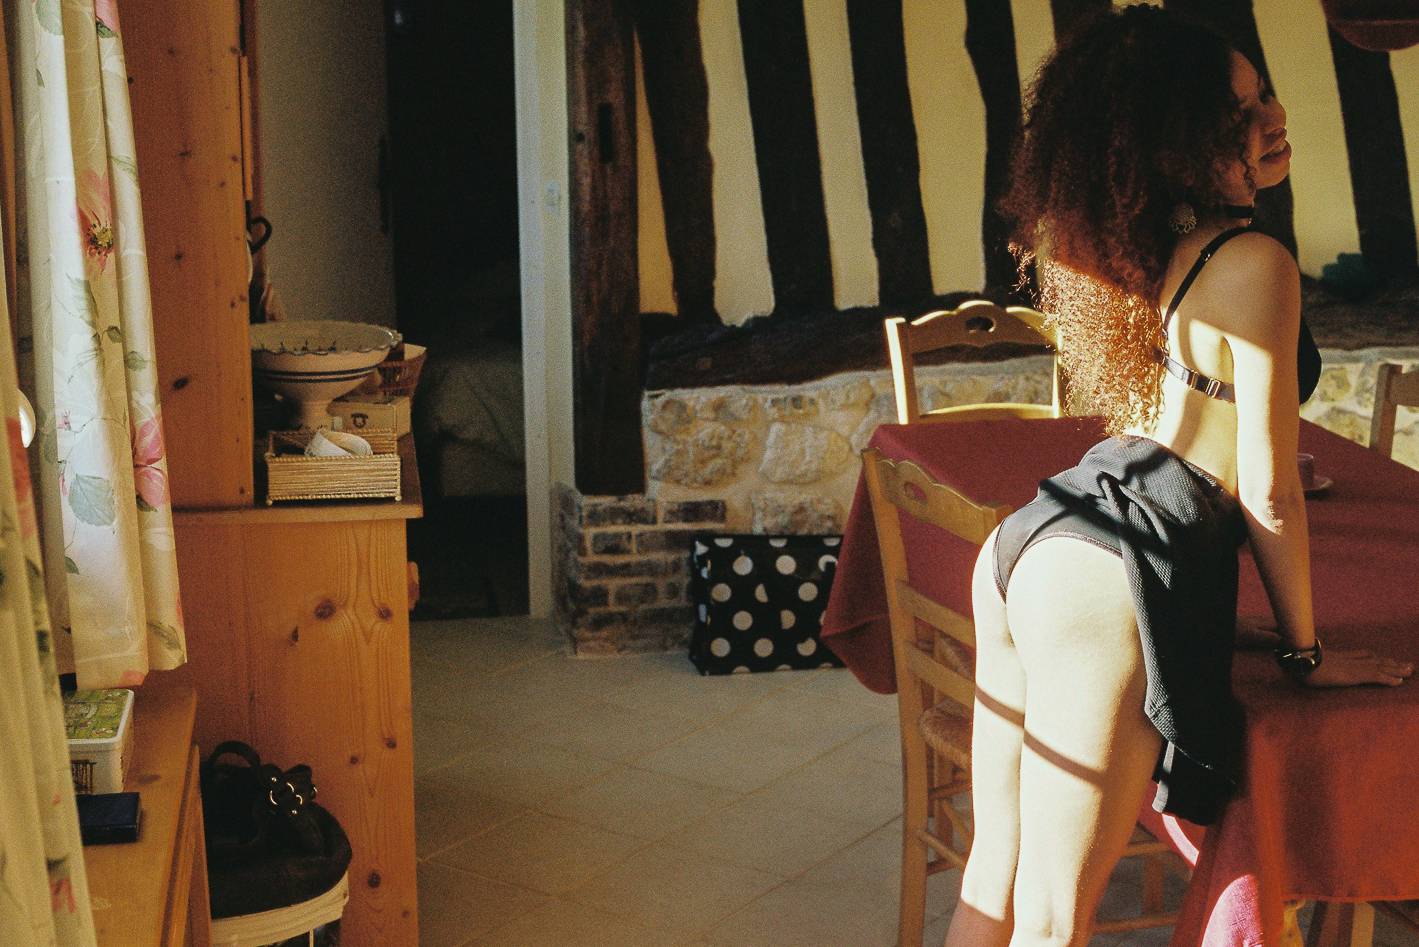 savannah lingerie paris les rituelles_6.JPG